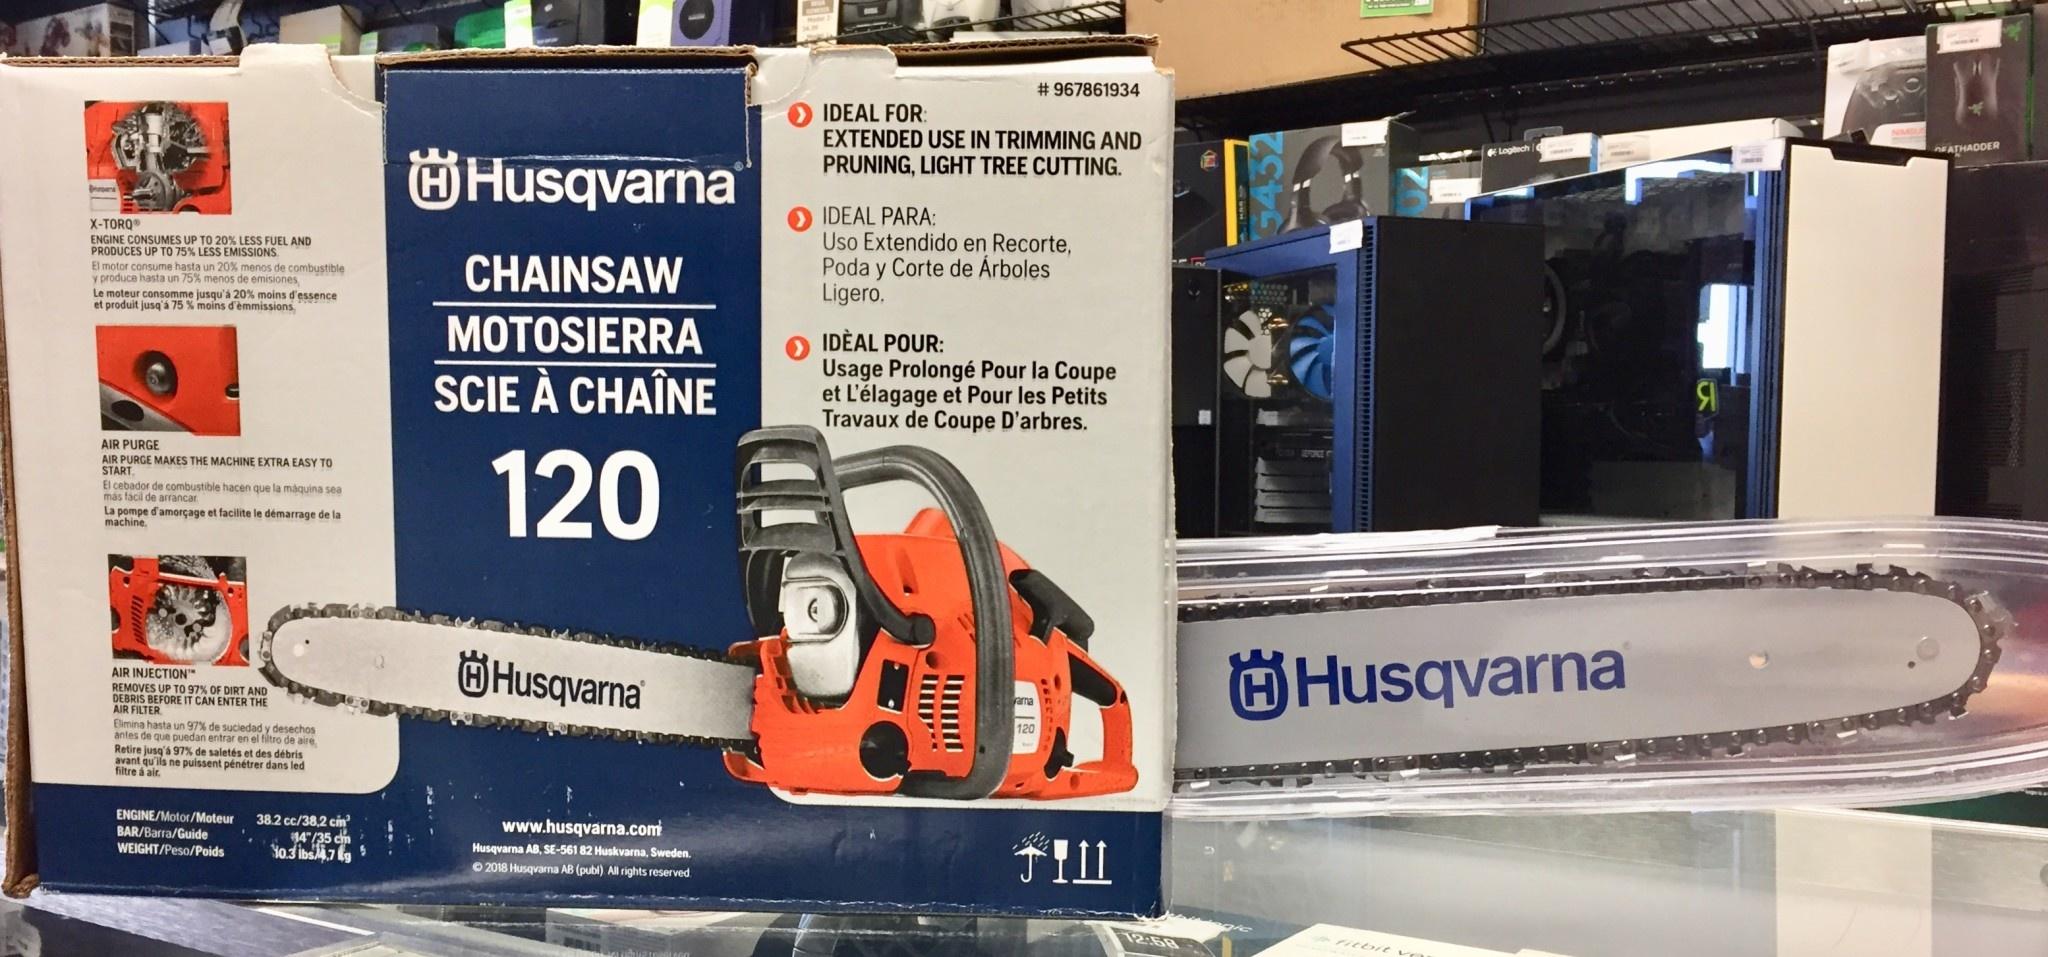 "New - Husqvarna 120 14"" Chainsaw - #967861934"